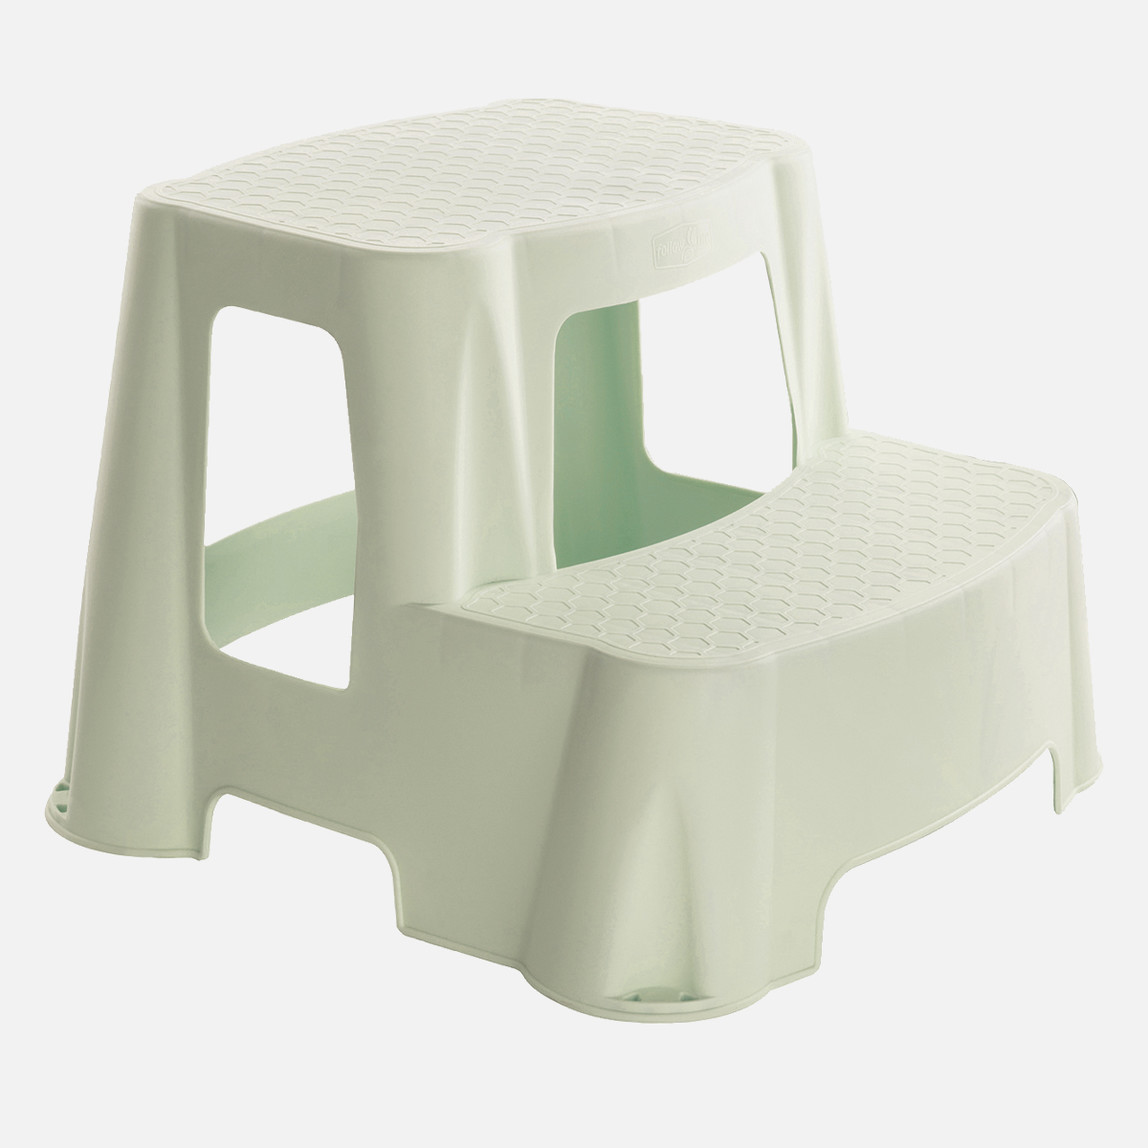 2 Basamaklı Plastik Merdiven - Krem